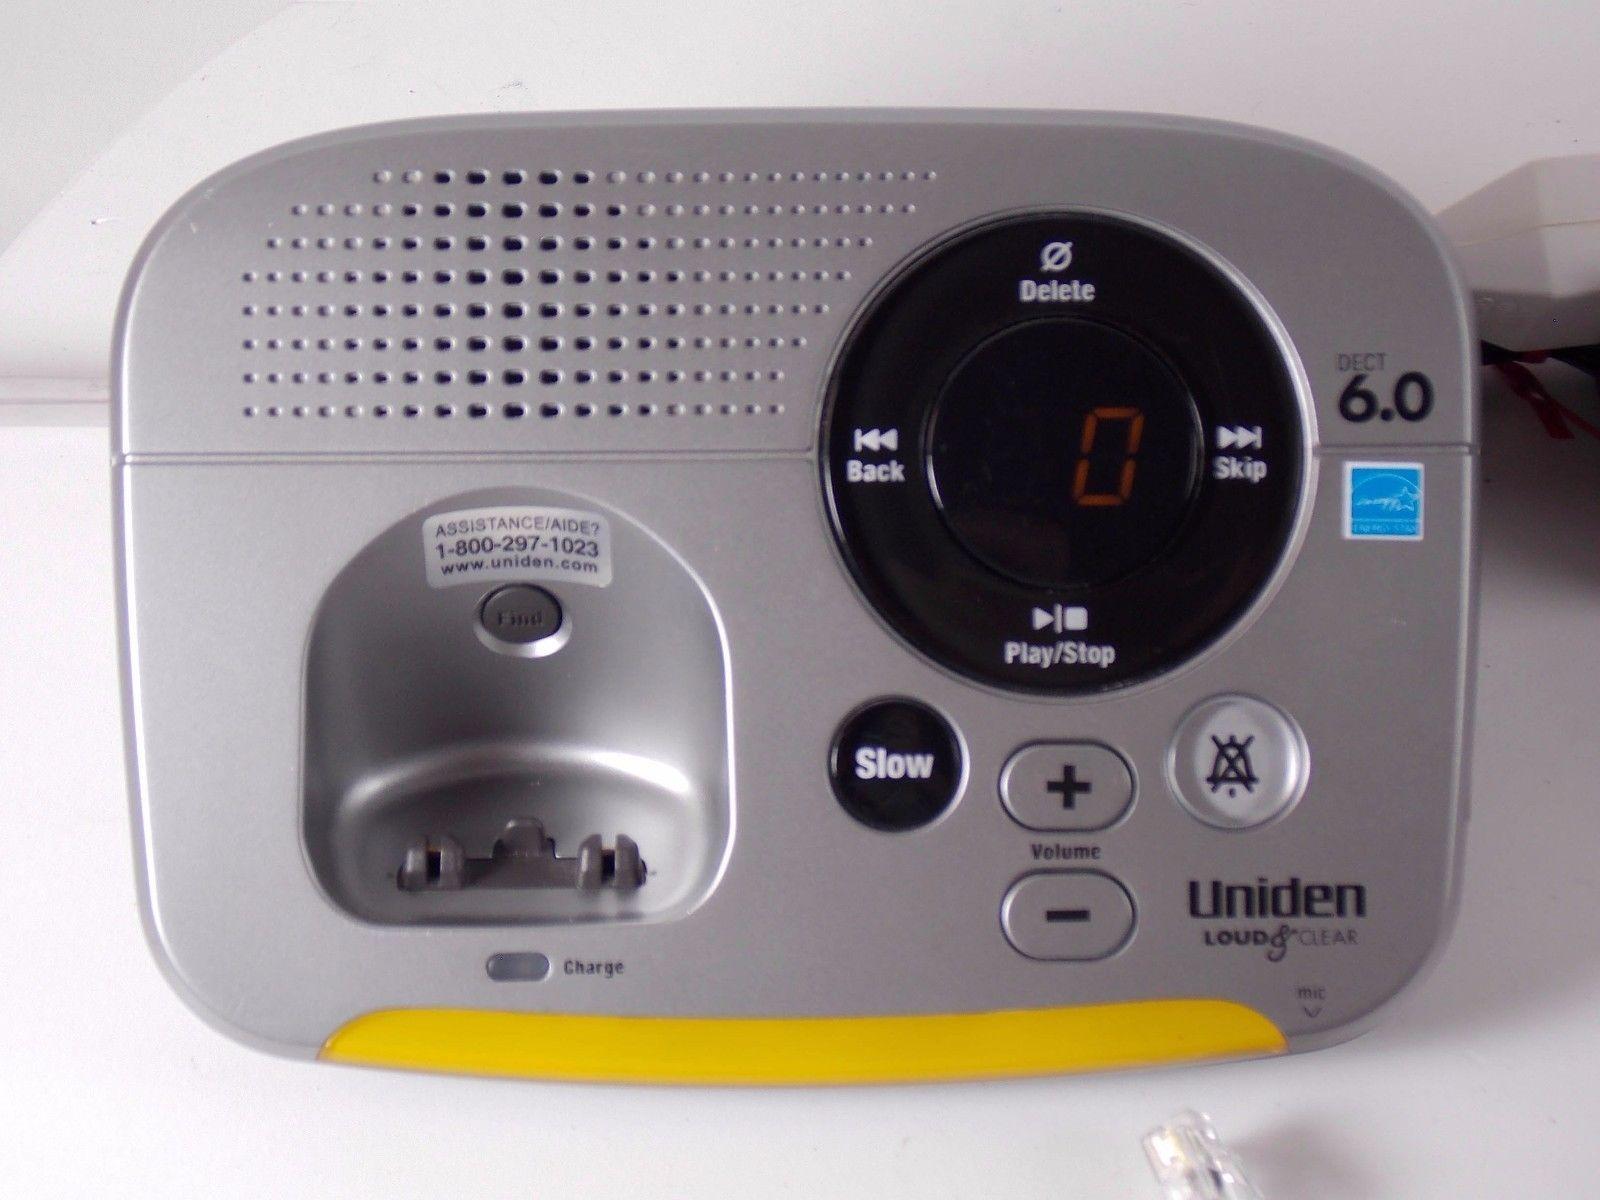 ... Uniden EZAI2997 Loud & Clear 6.0 Single Line Cordless Phone Amplified  Hearing ...